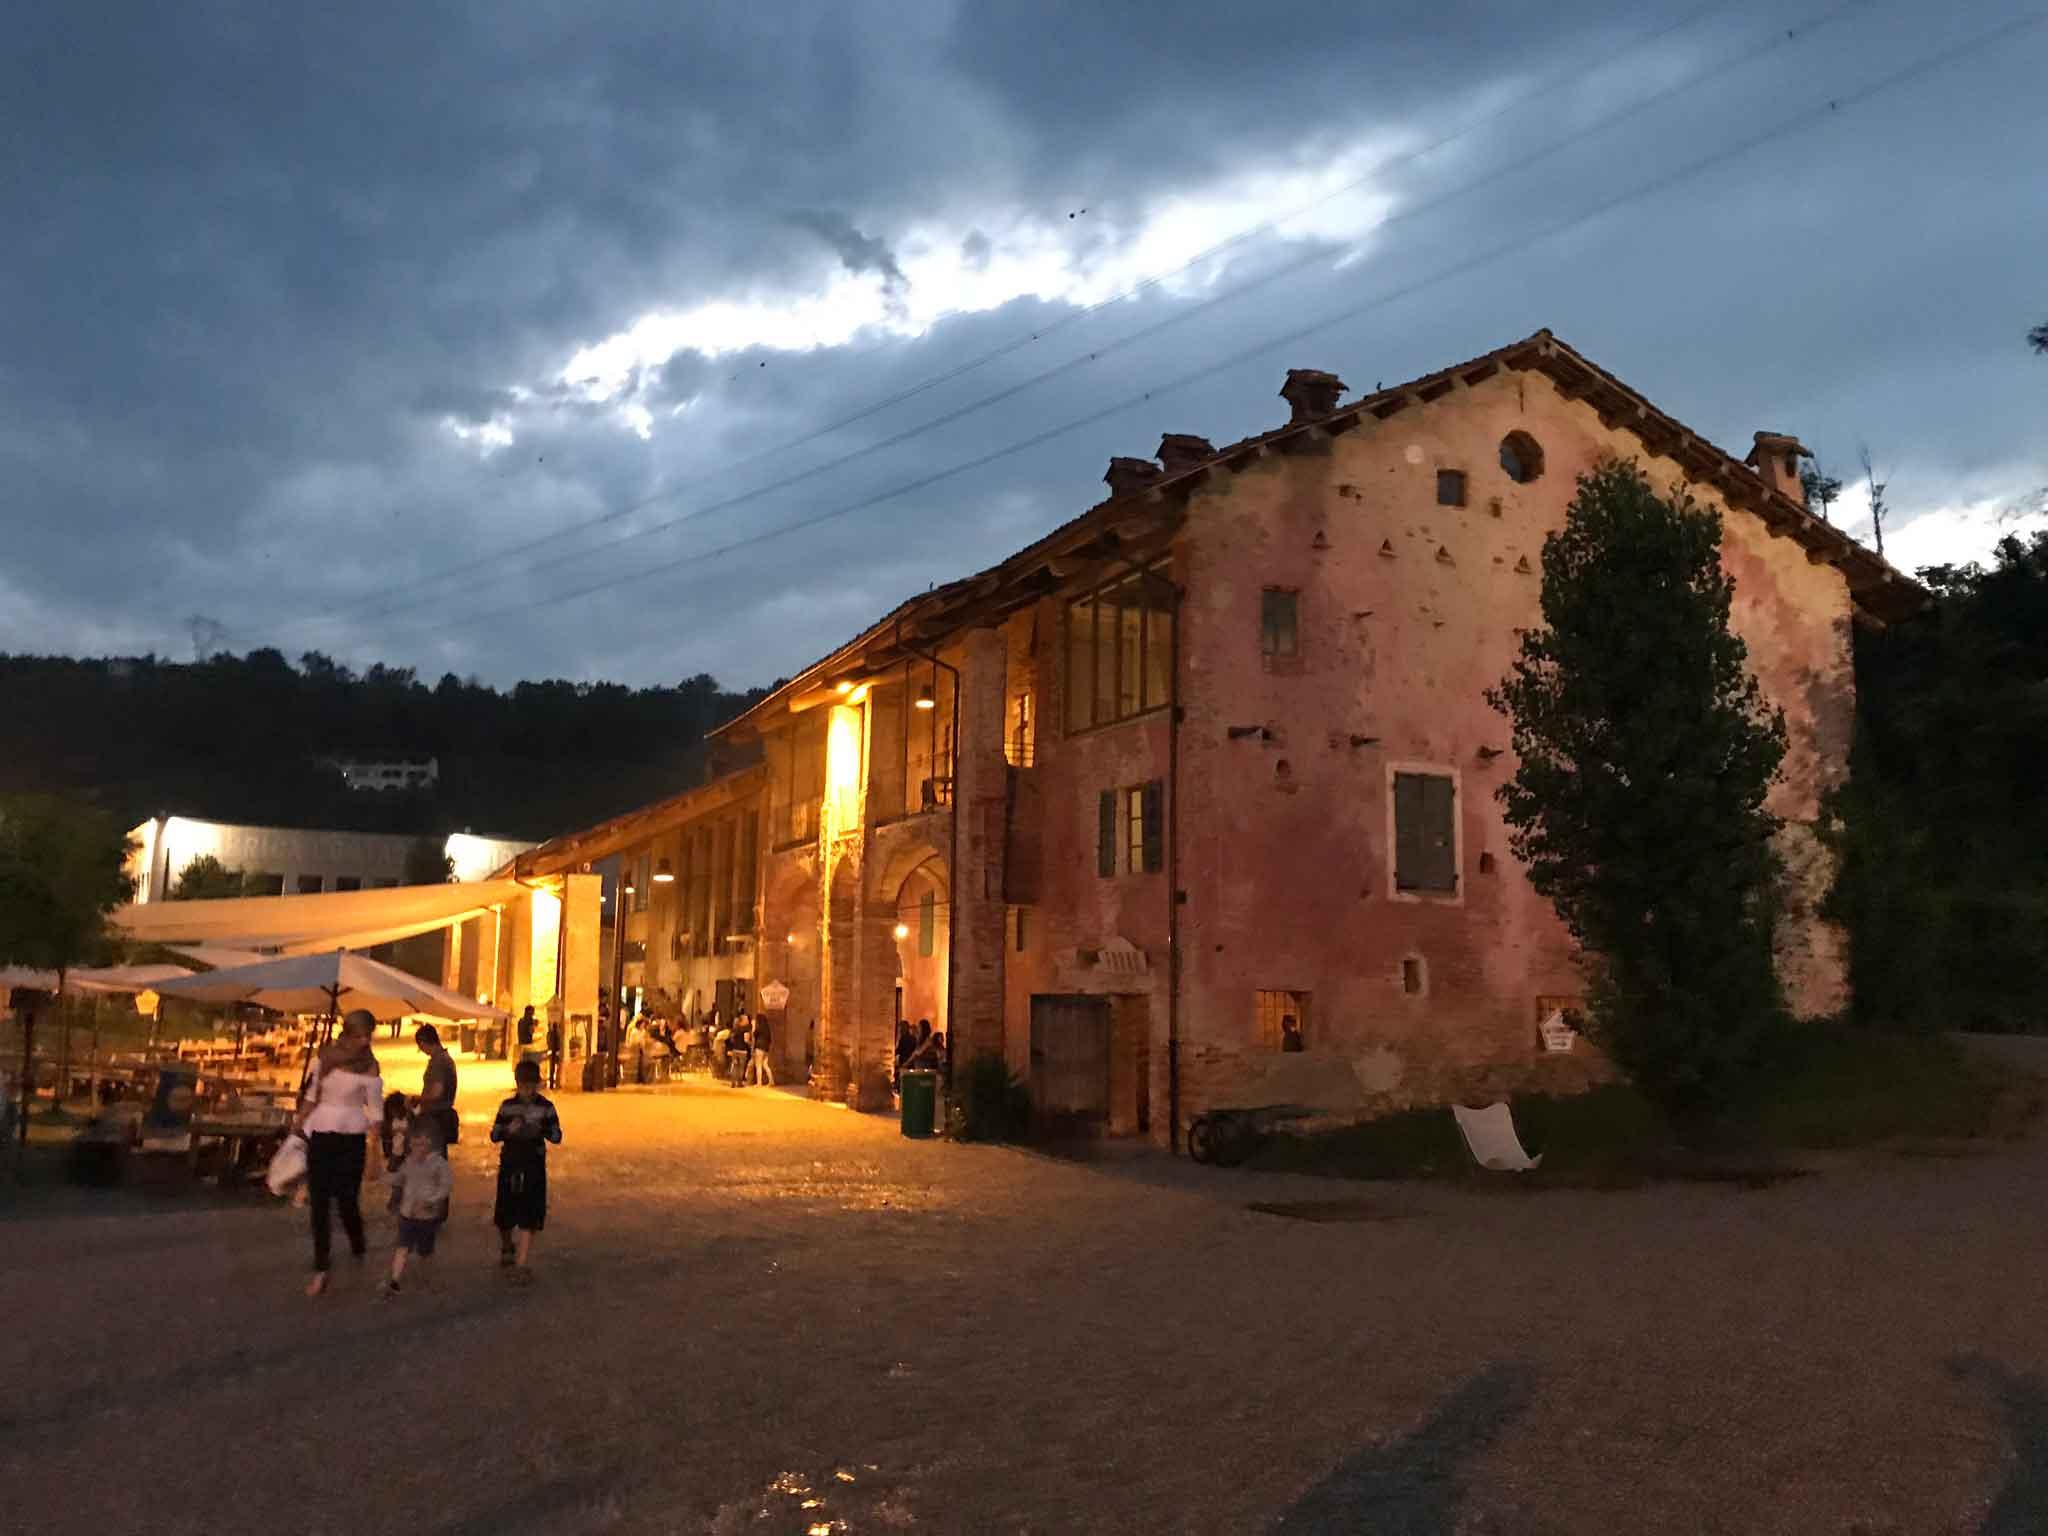 Baladin Open Garden Piozzo Langhe Piemonte casolare